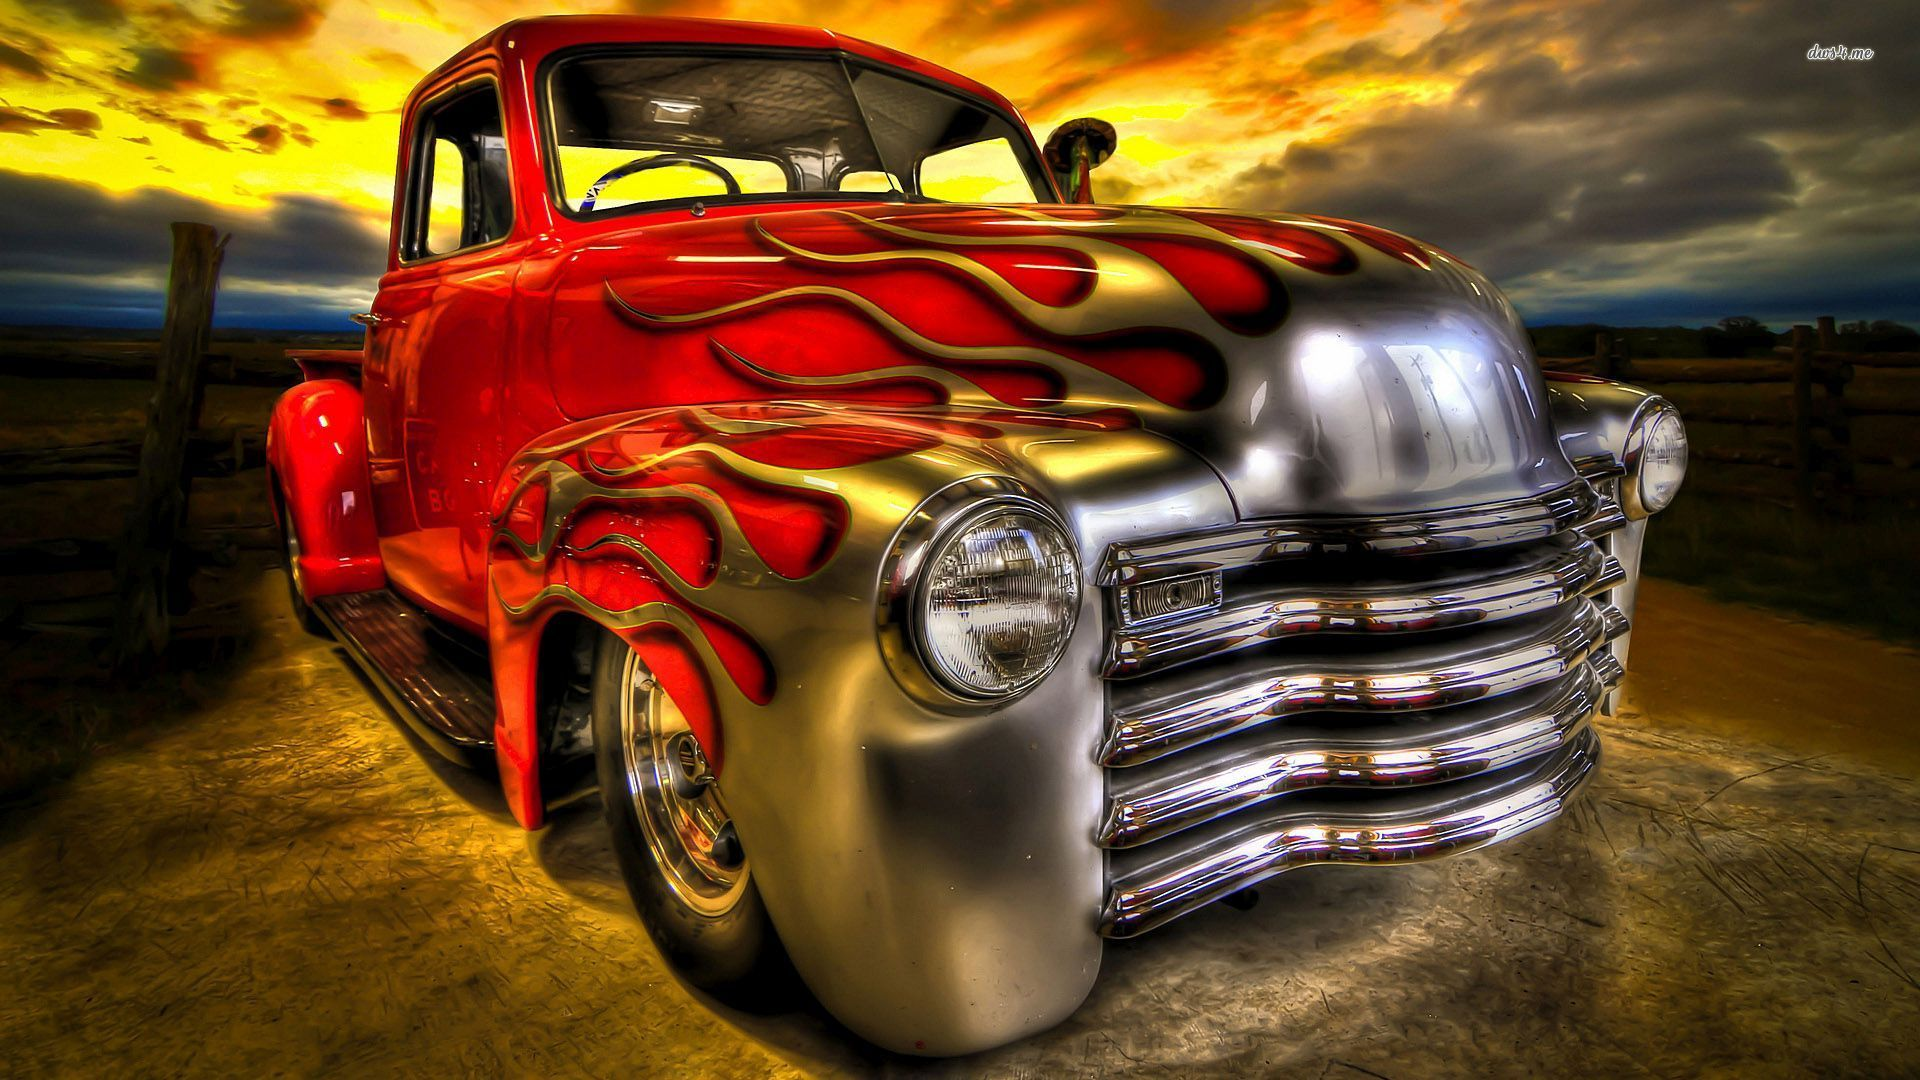 Hot Rod - HD Wallpaper